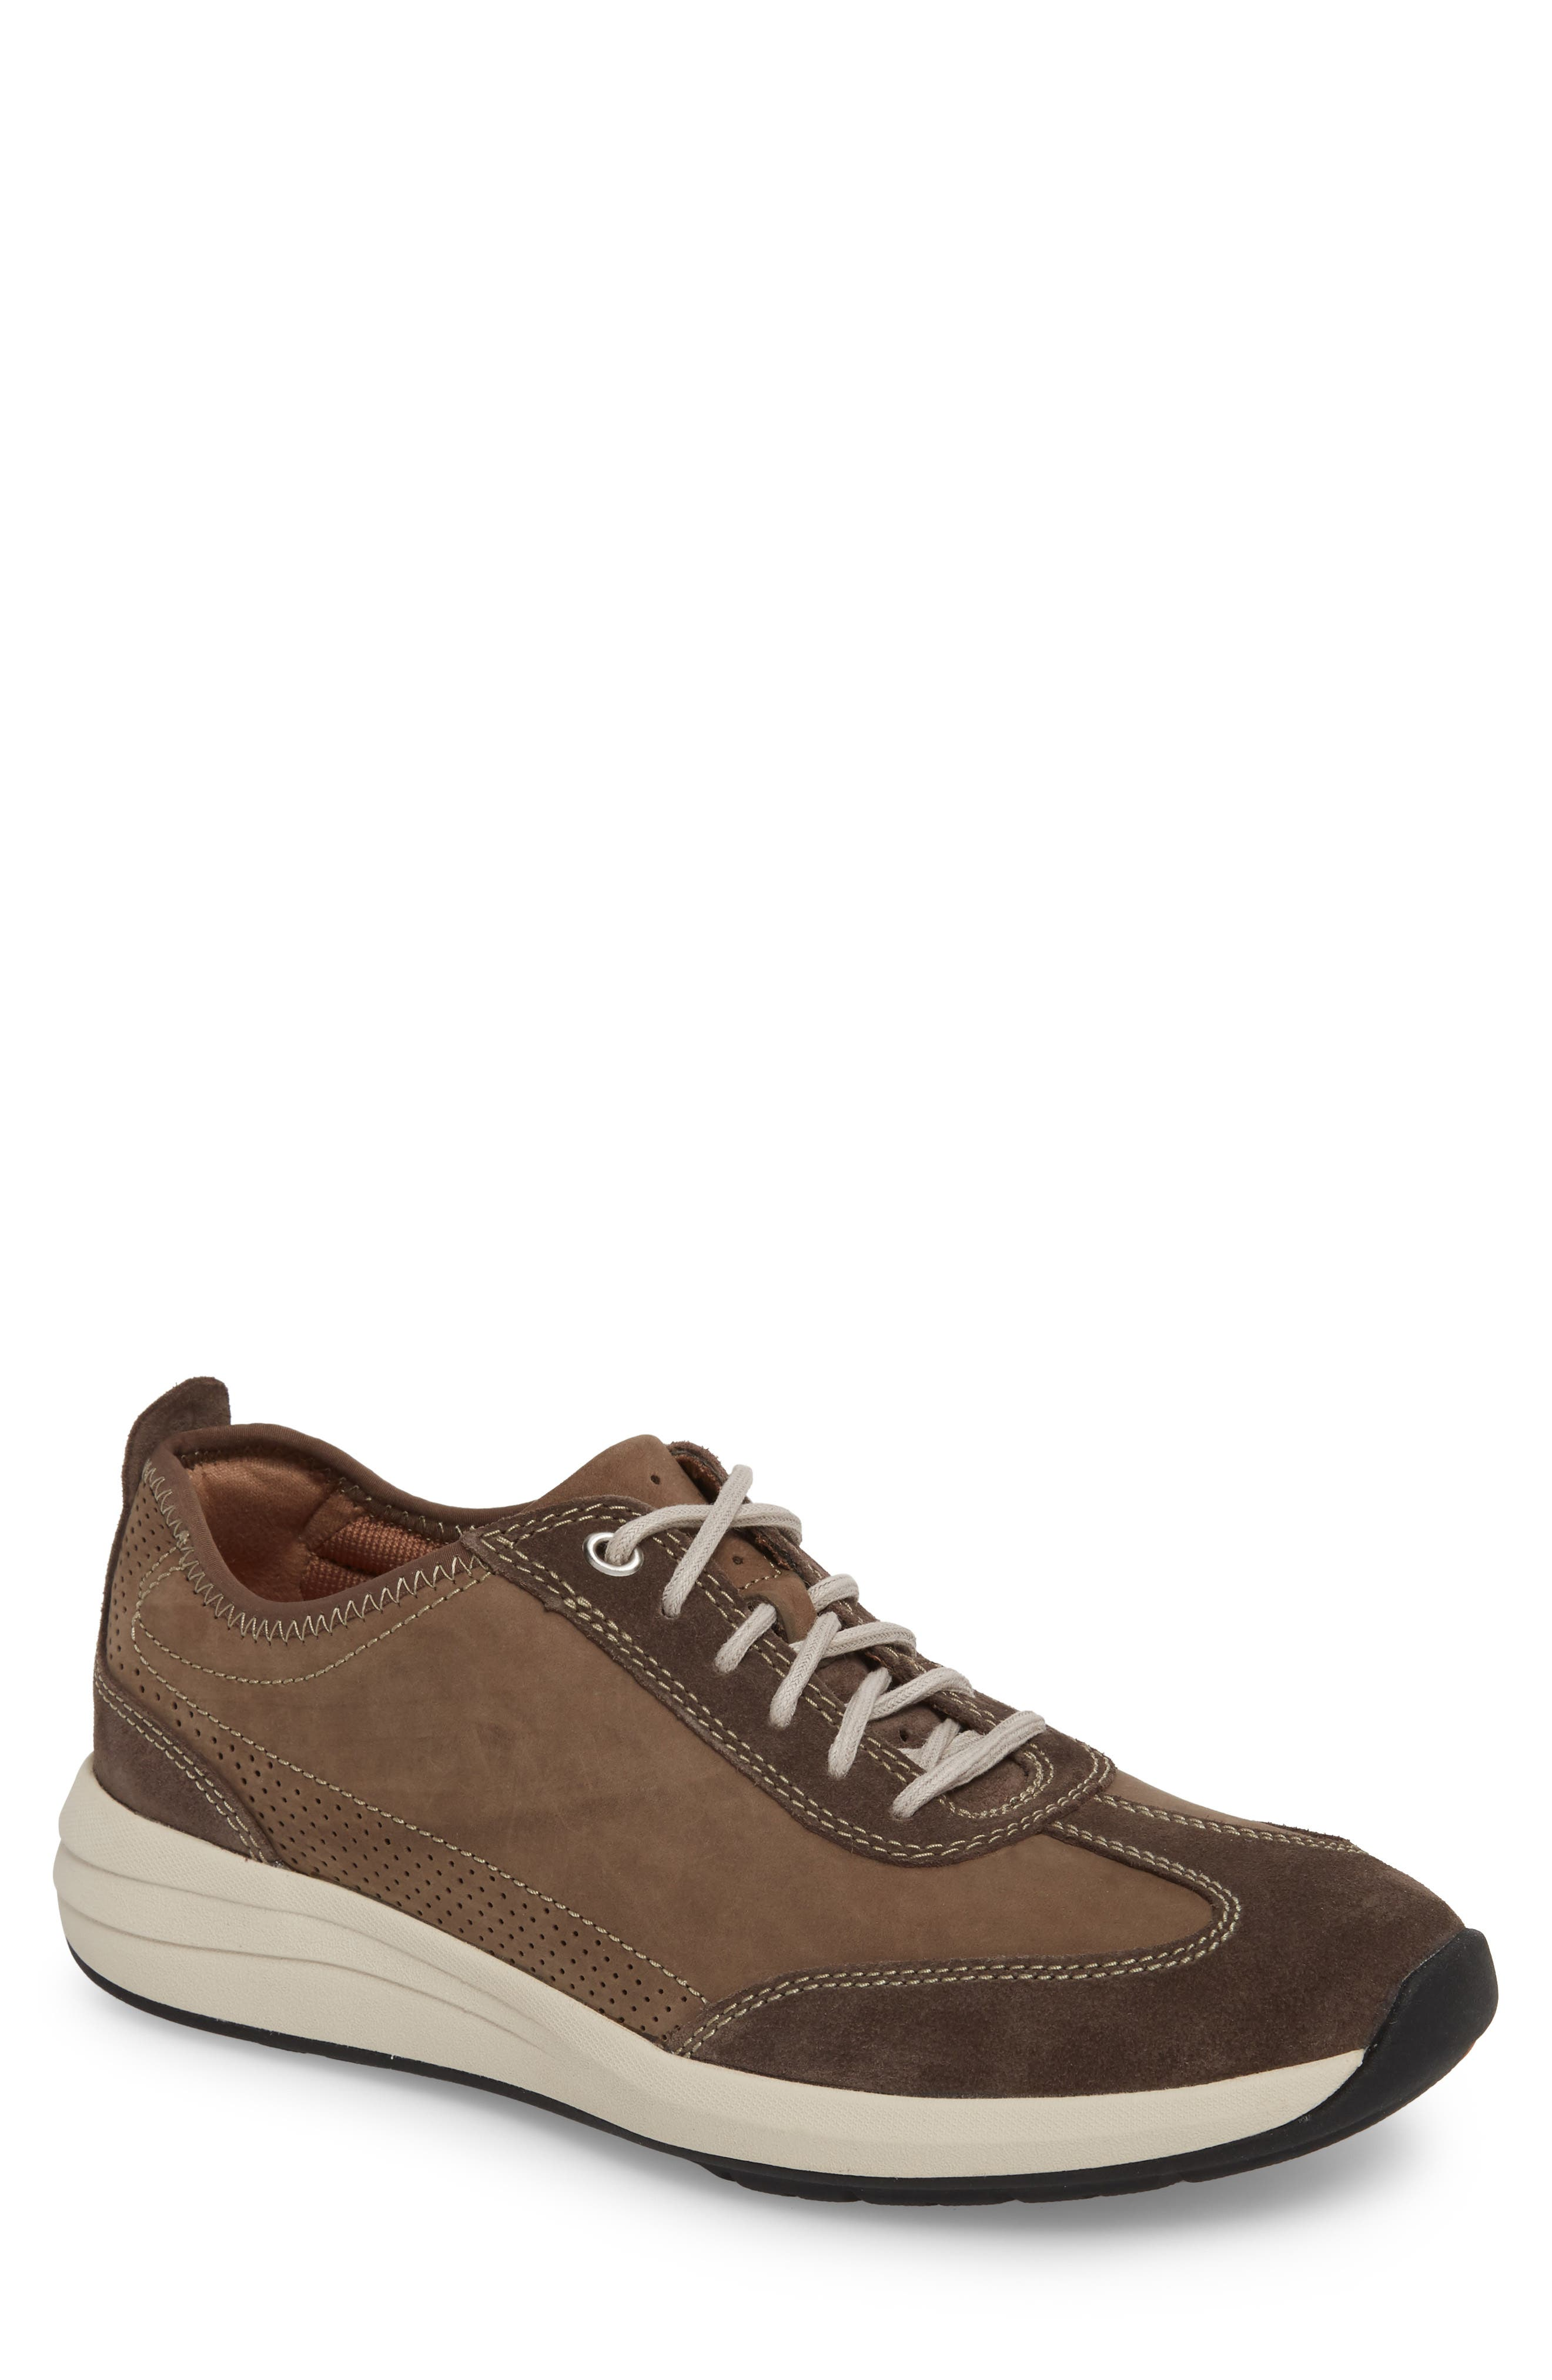 Clarks<sup>®</sup> Un Coast Low Top Sneaker,                         Main,                         color, Taupe Nubuck